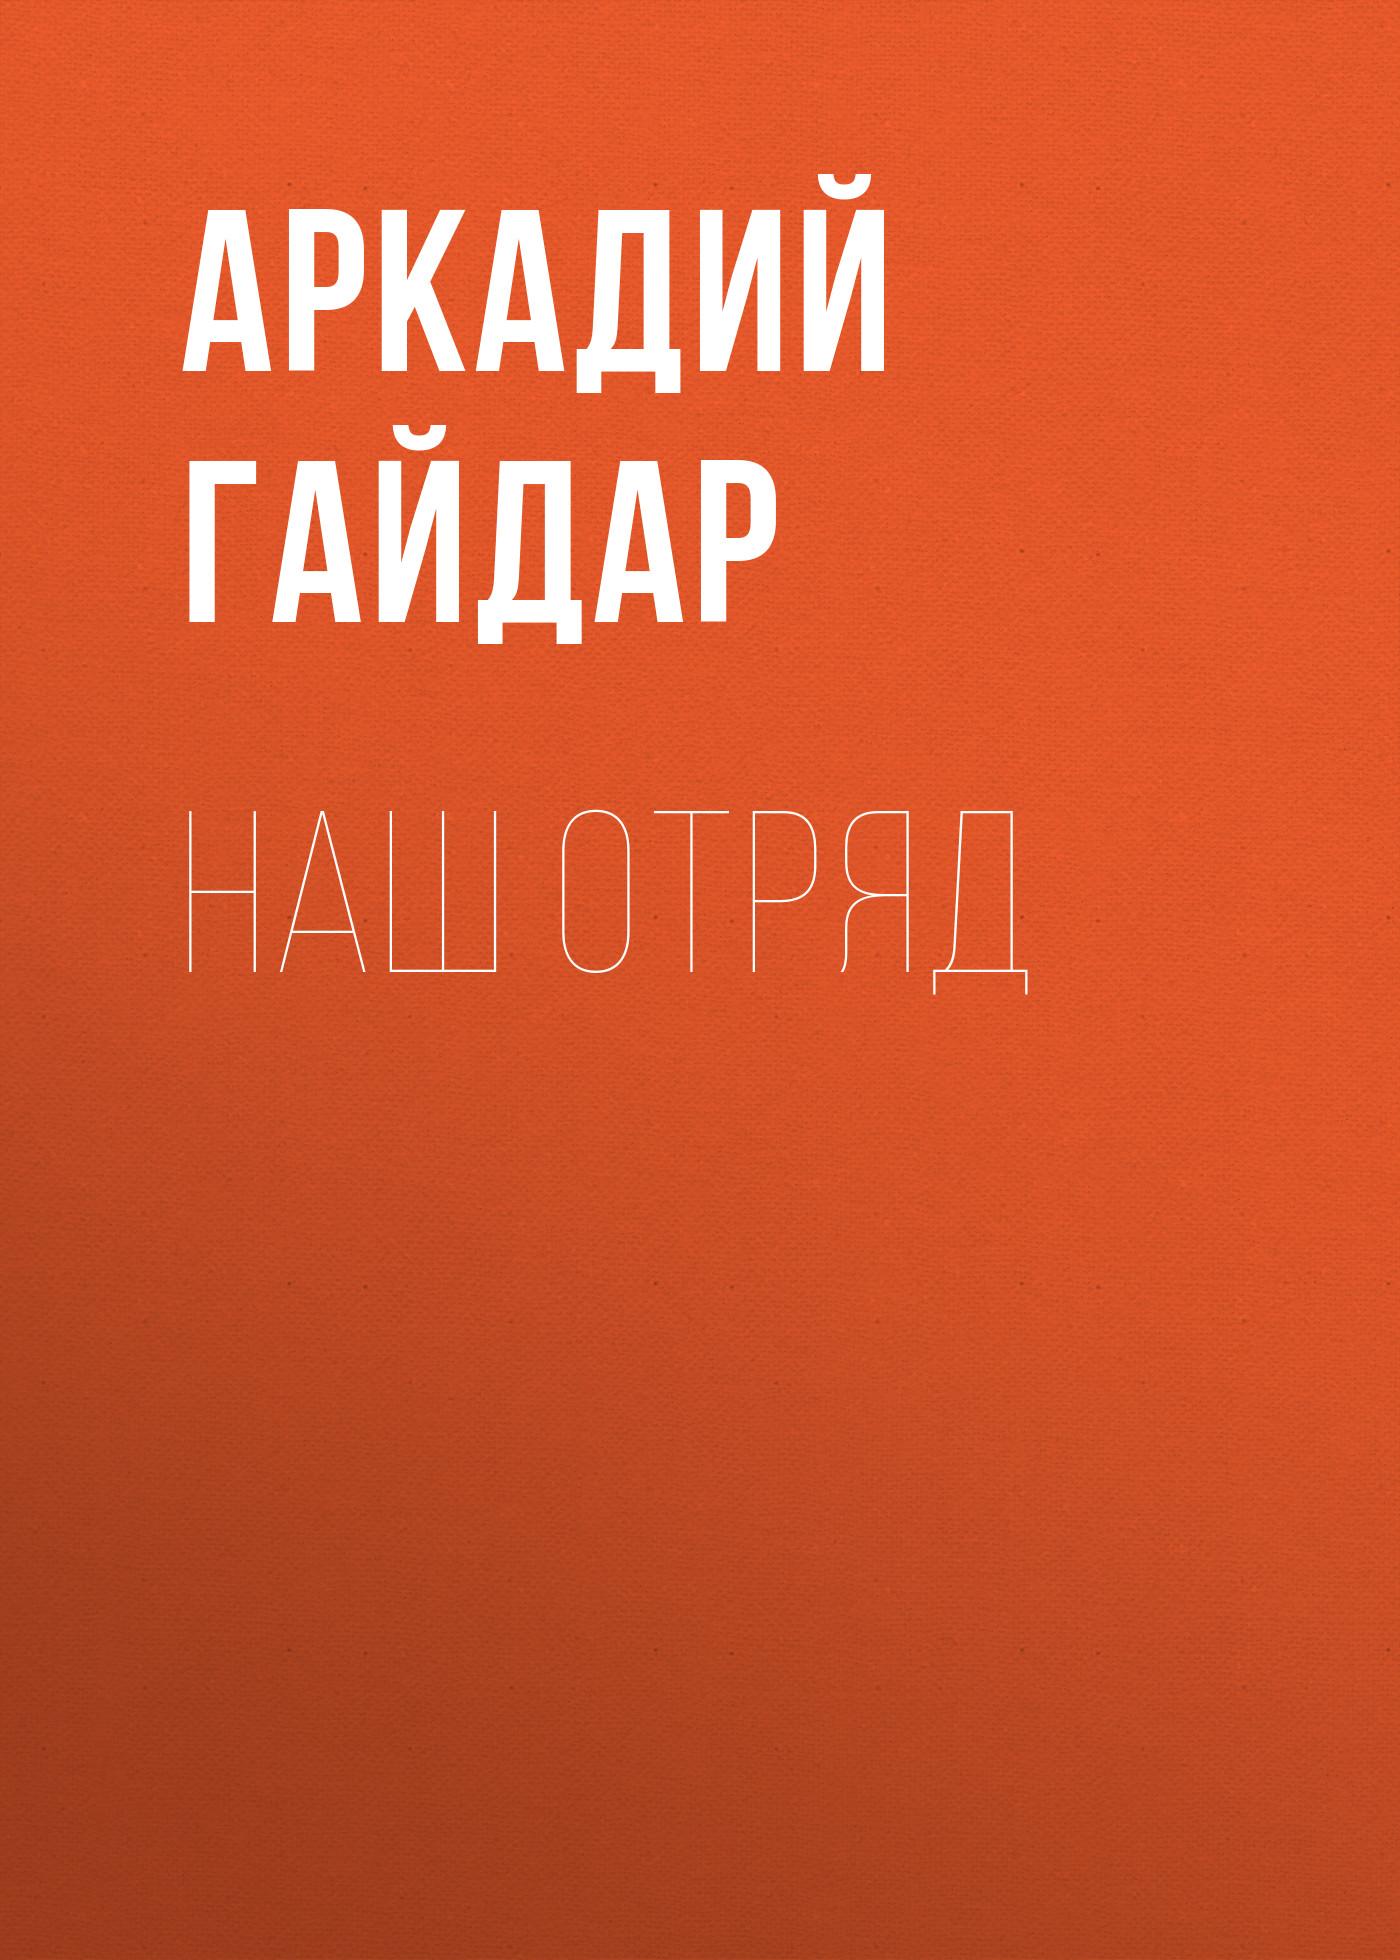 Аркадий Гайдар Наш отряд аркадий гайдар избранное